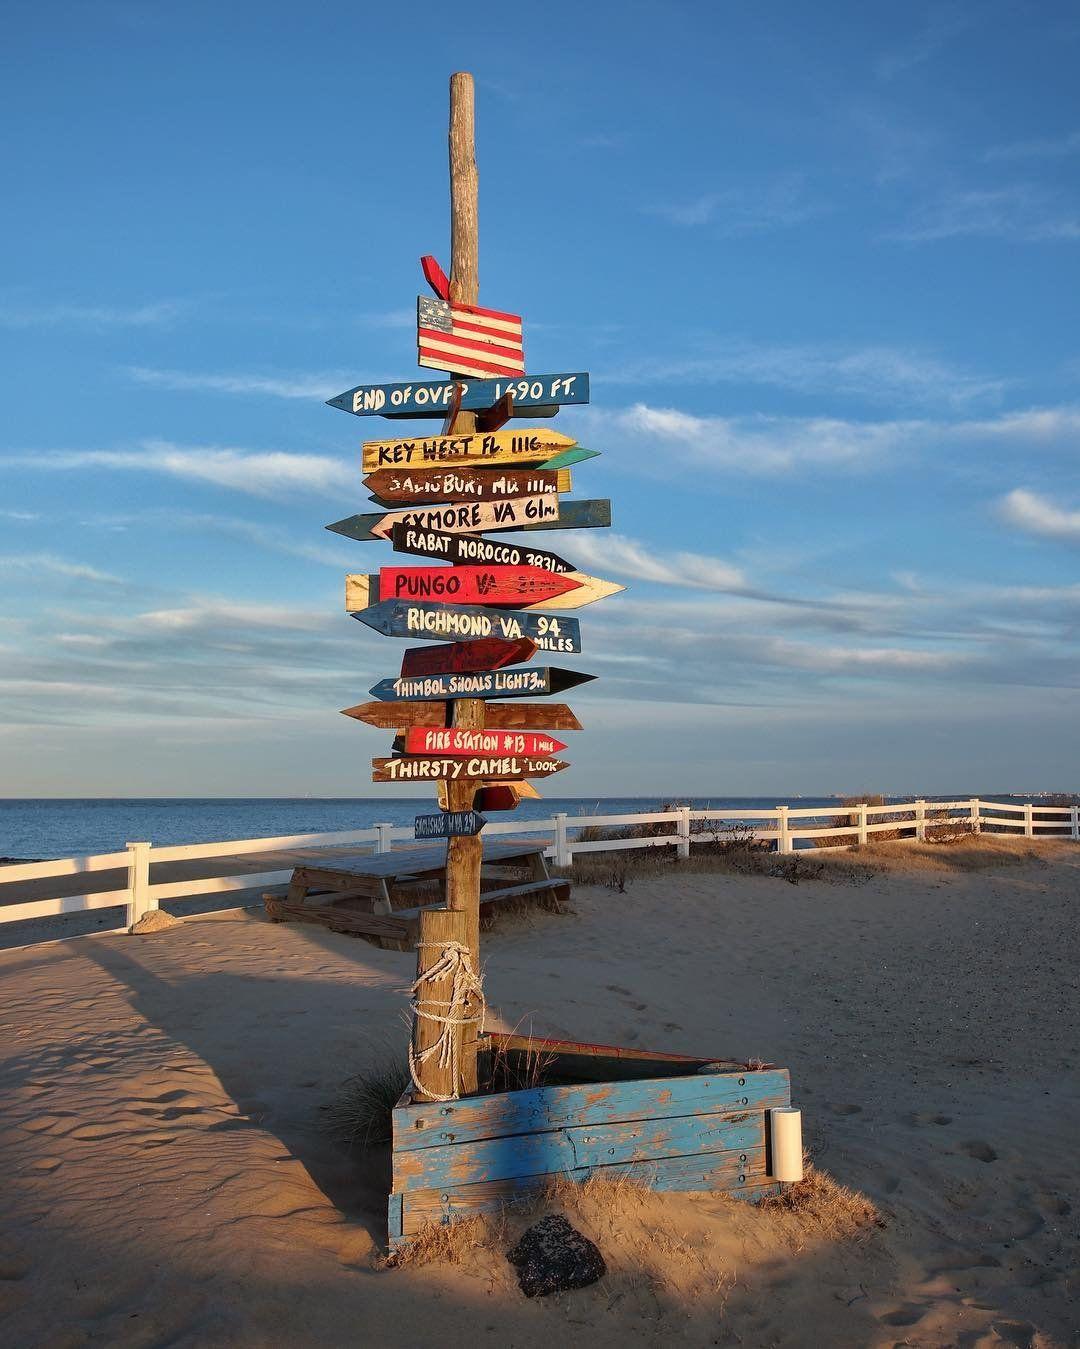 East Beach And Ocean View Beaches Offer